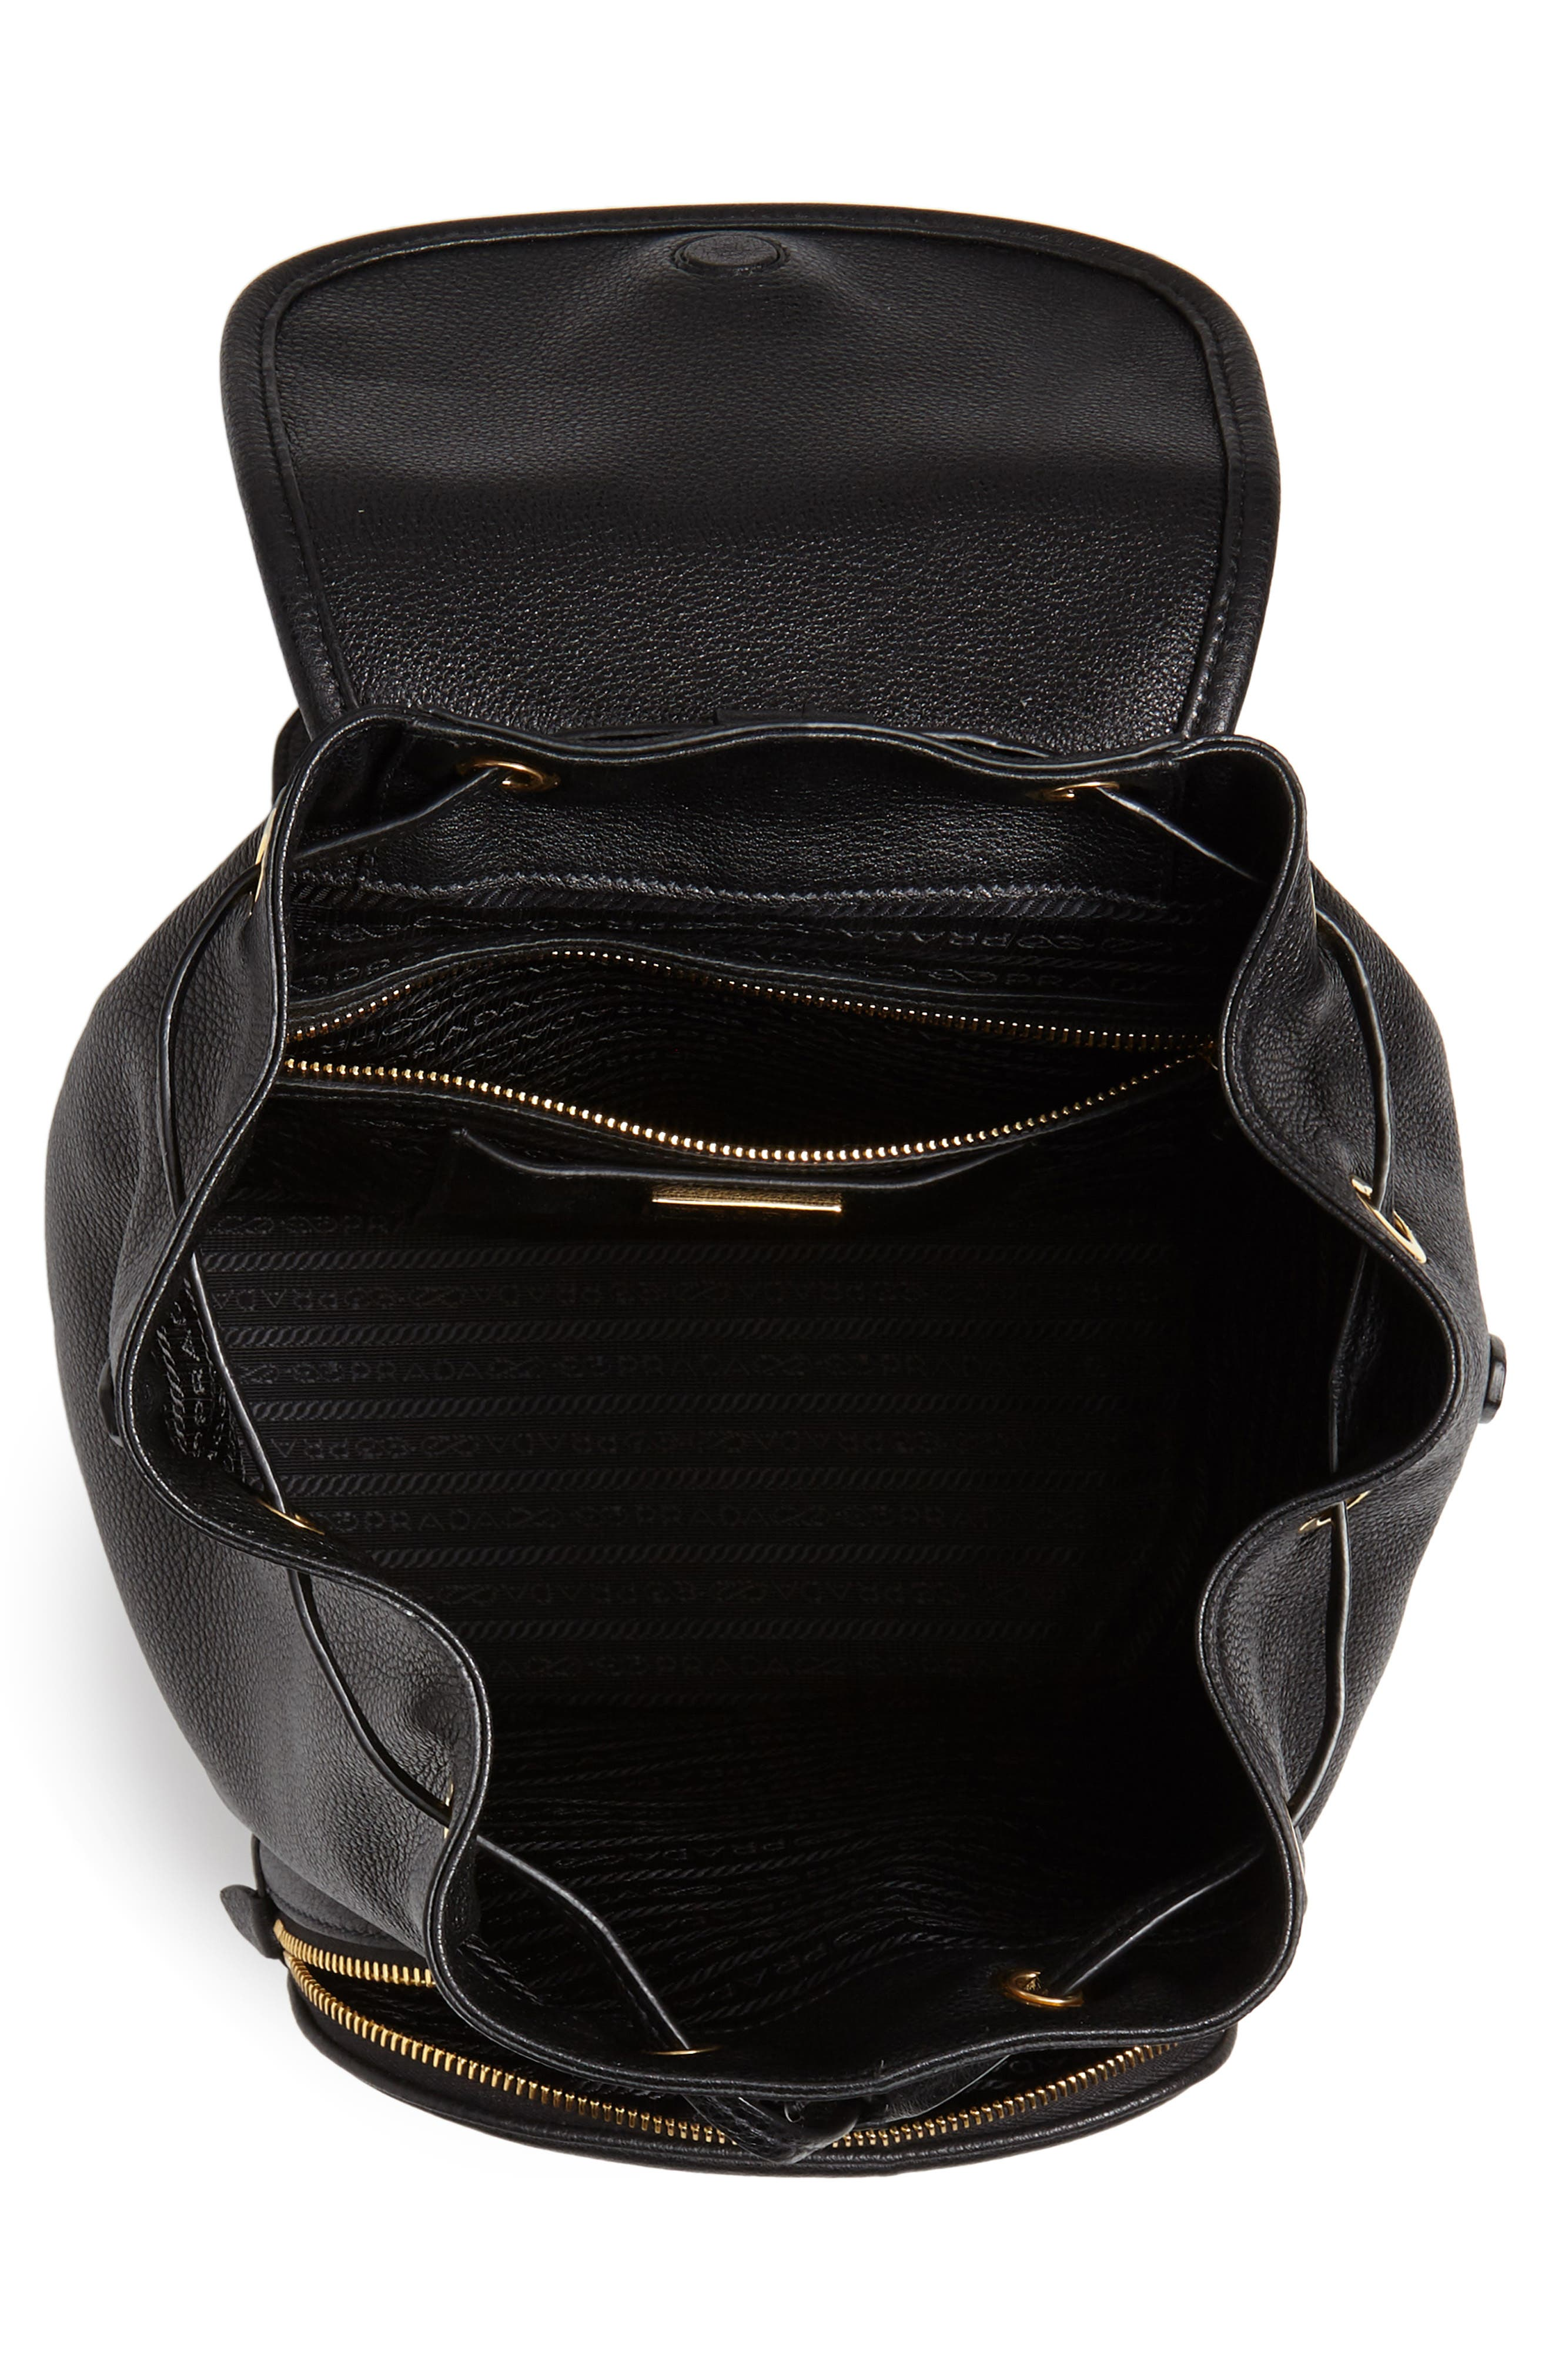 PRADA, Vitello Daino Pebbled Leather Backpack, Alternate thumbnail 5, color, 001